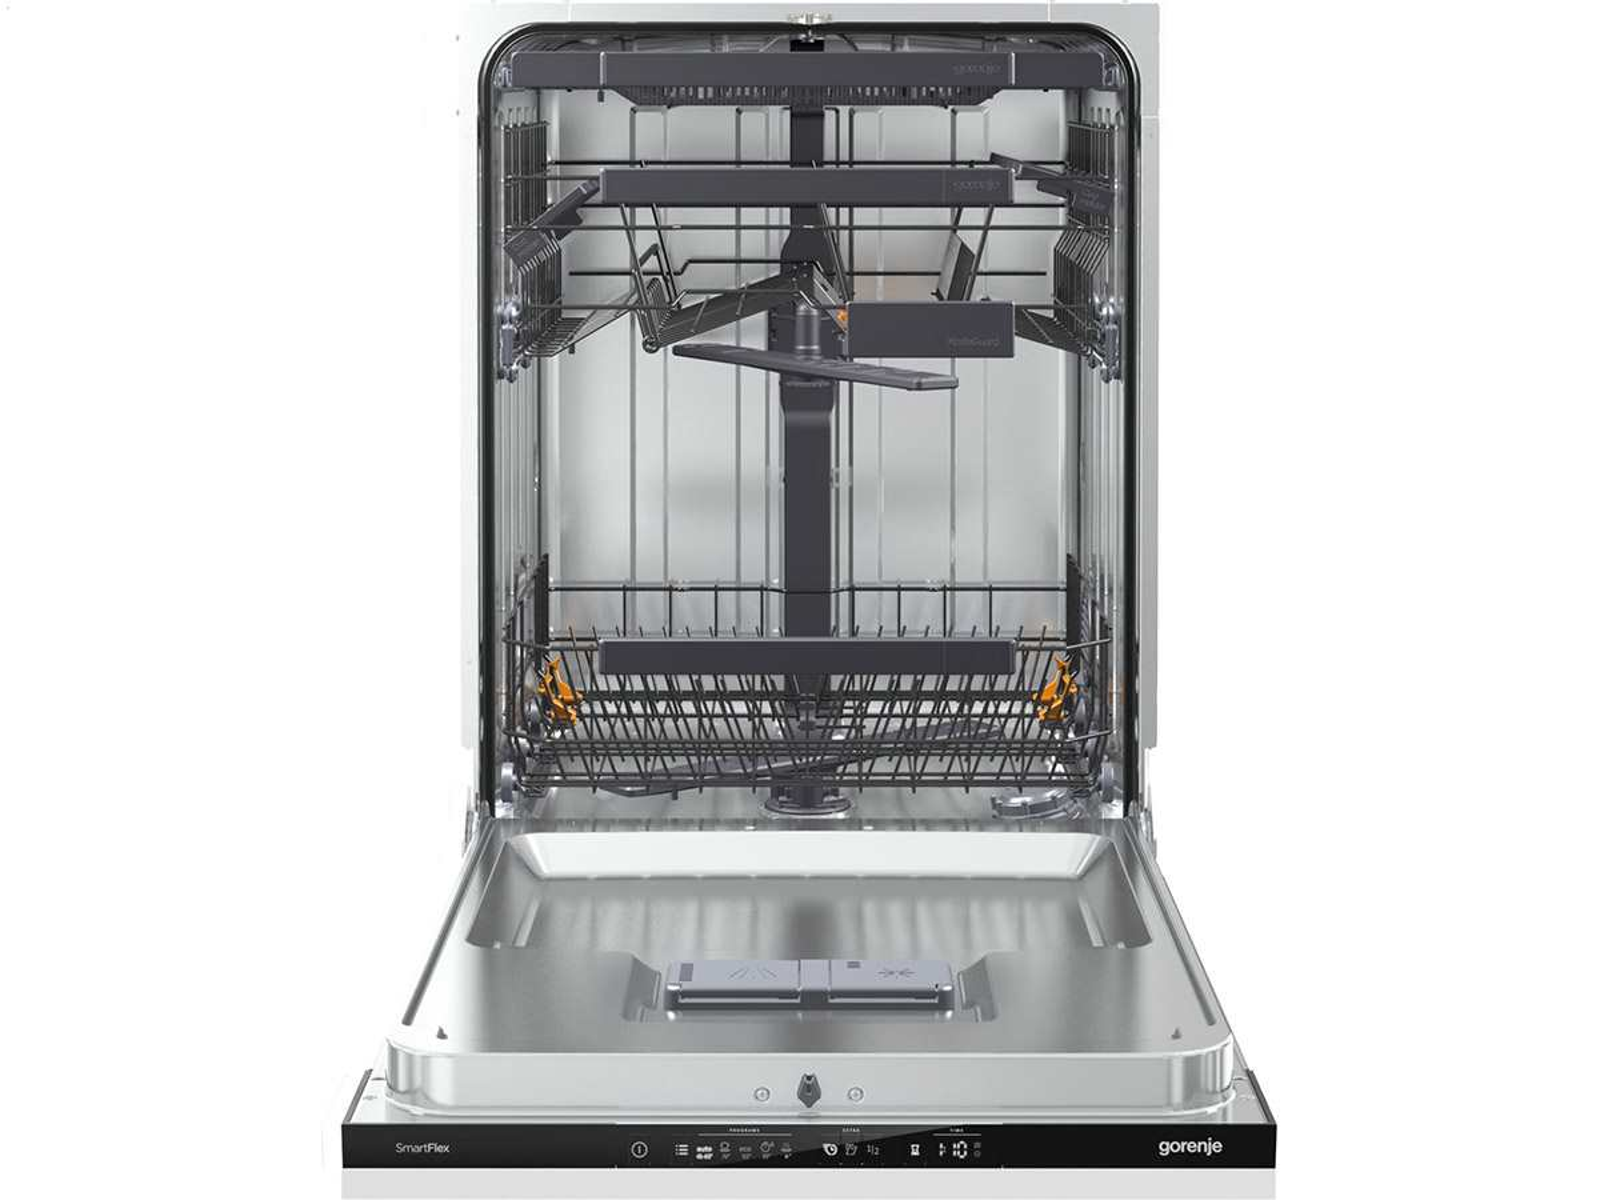 Gorenje Kühlschrank Xxl : Gorenje gv 65160 xxl vollintegrierbarer einbaugeschirrspüler